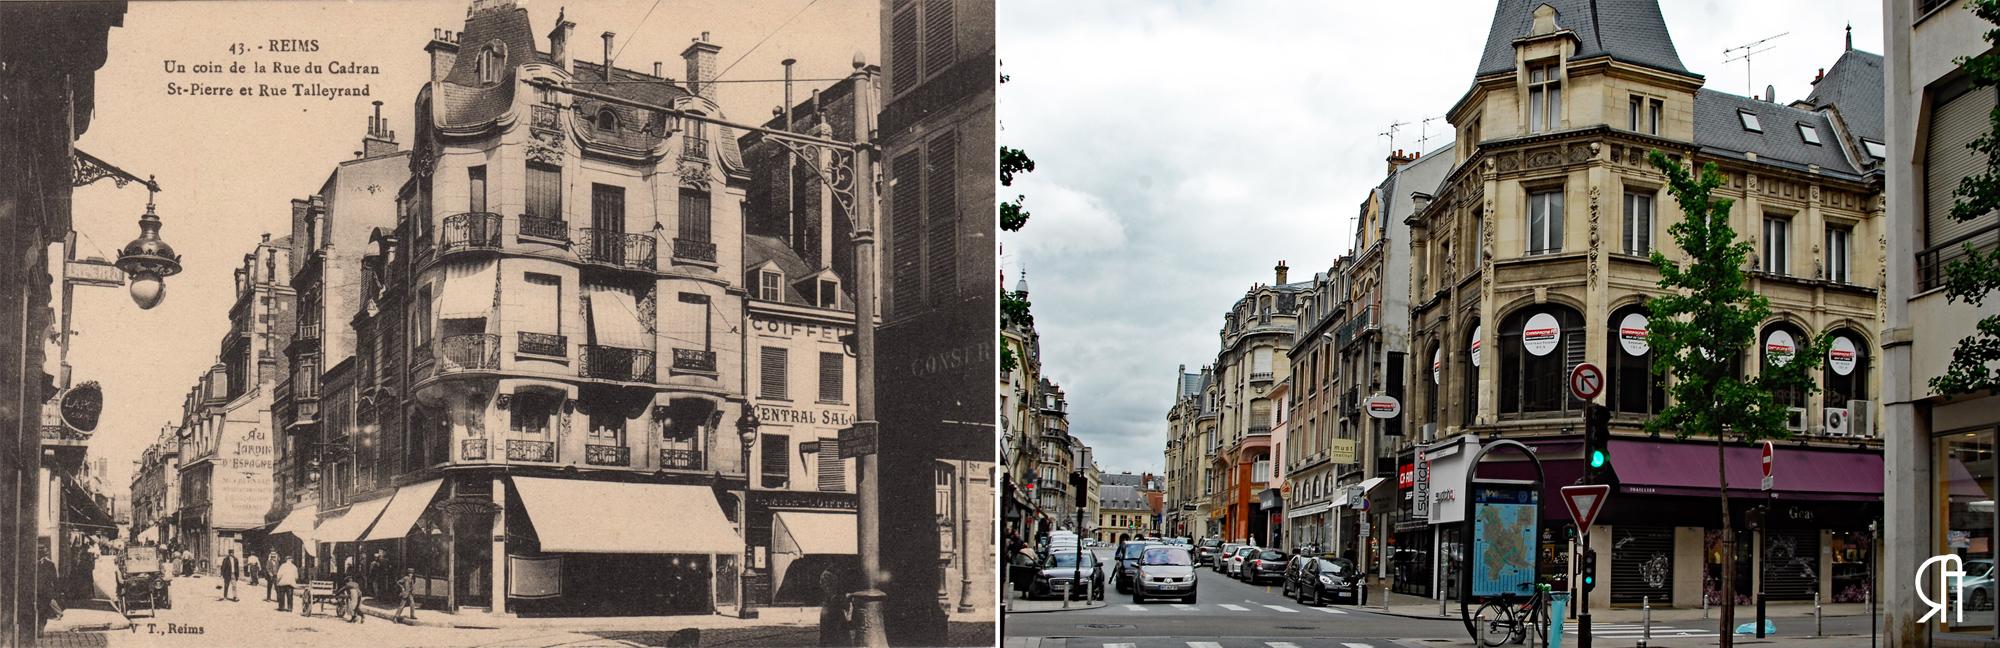 Angle de la rue de Talleyrand et de la rue du Cadran-Saint-Pierre